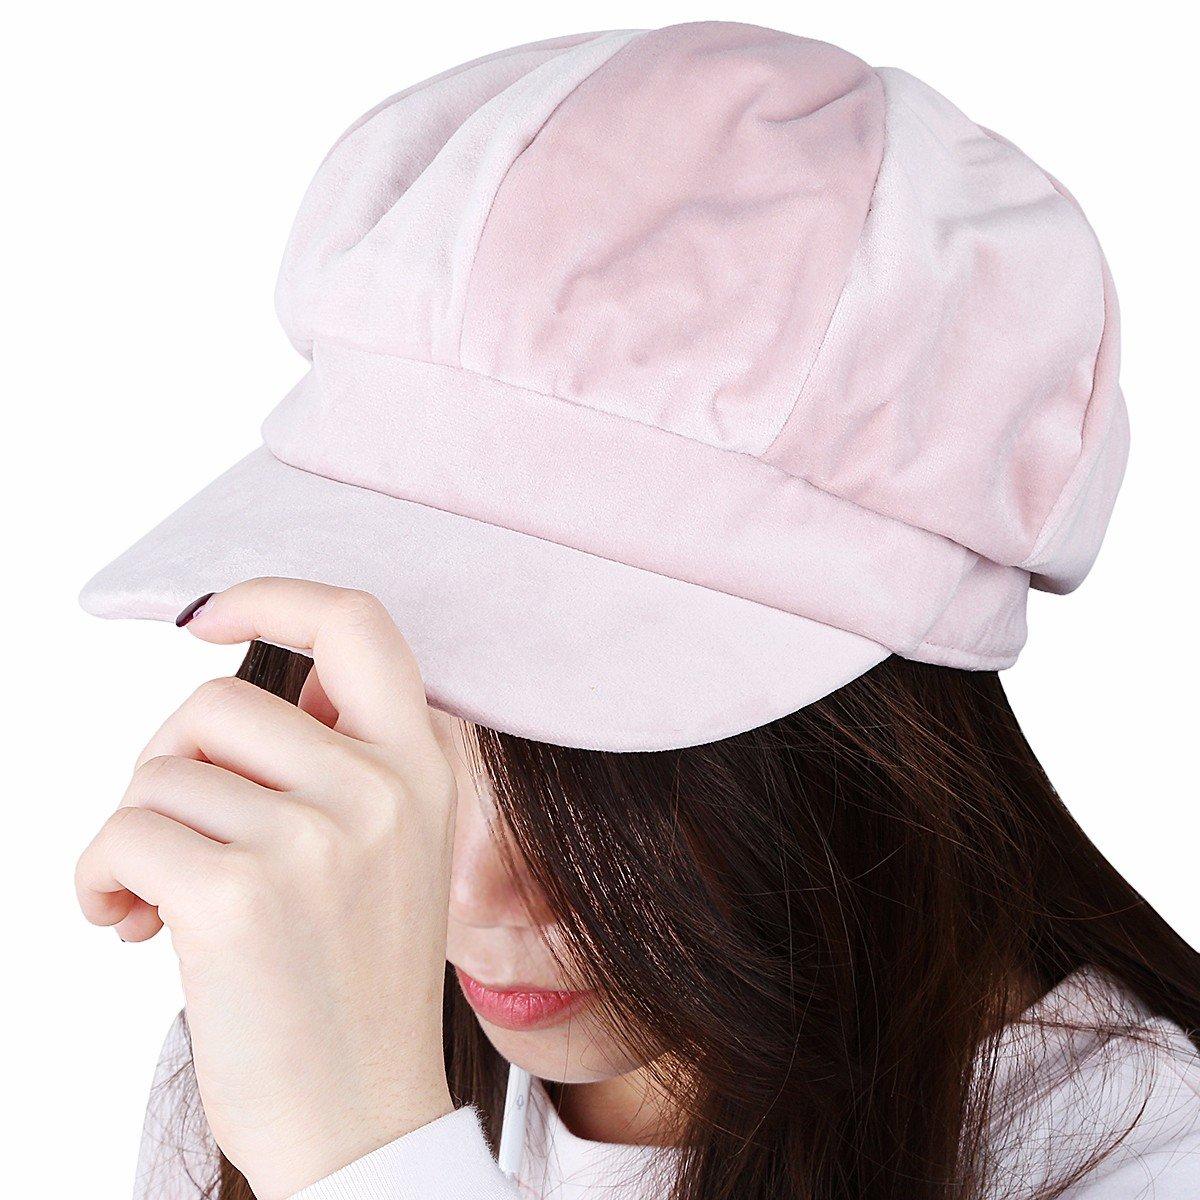 Samtree Newsboy Hats for Women,8 Panel Winter Warm Ivy Gatsby Cabbie Cap(05-Pink)